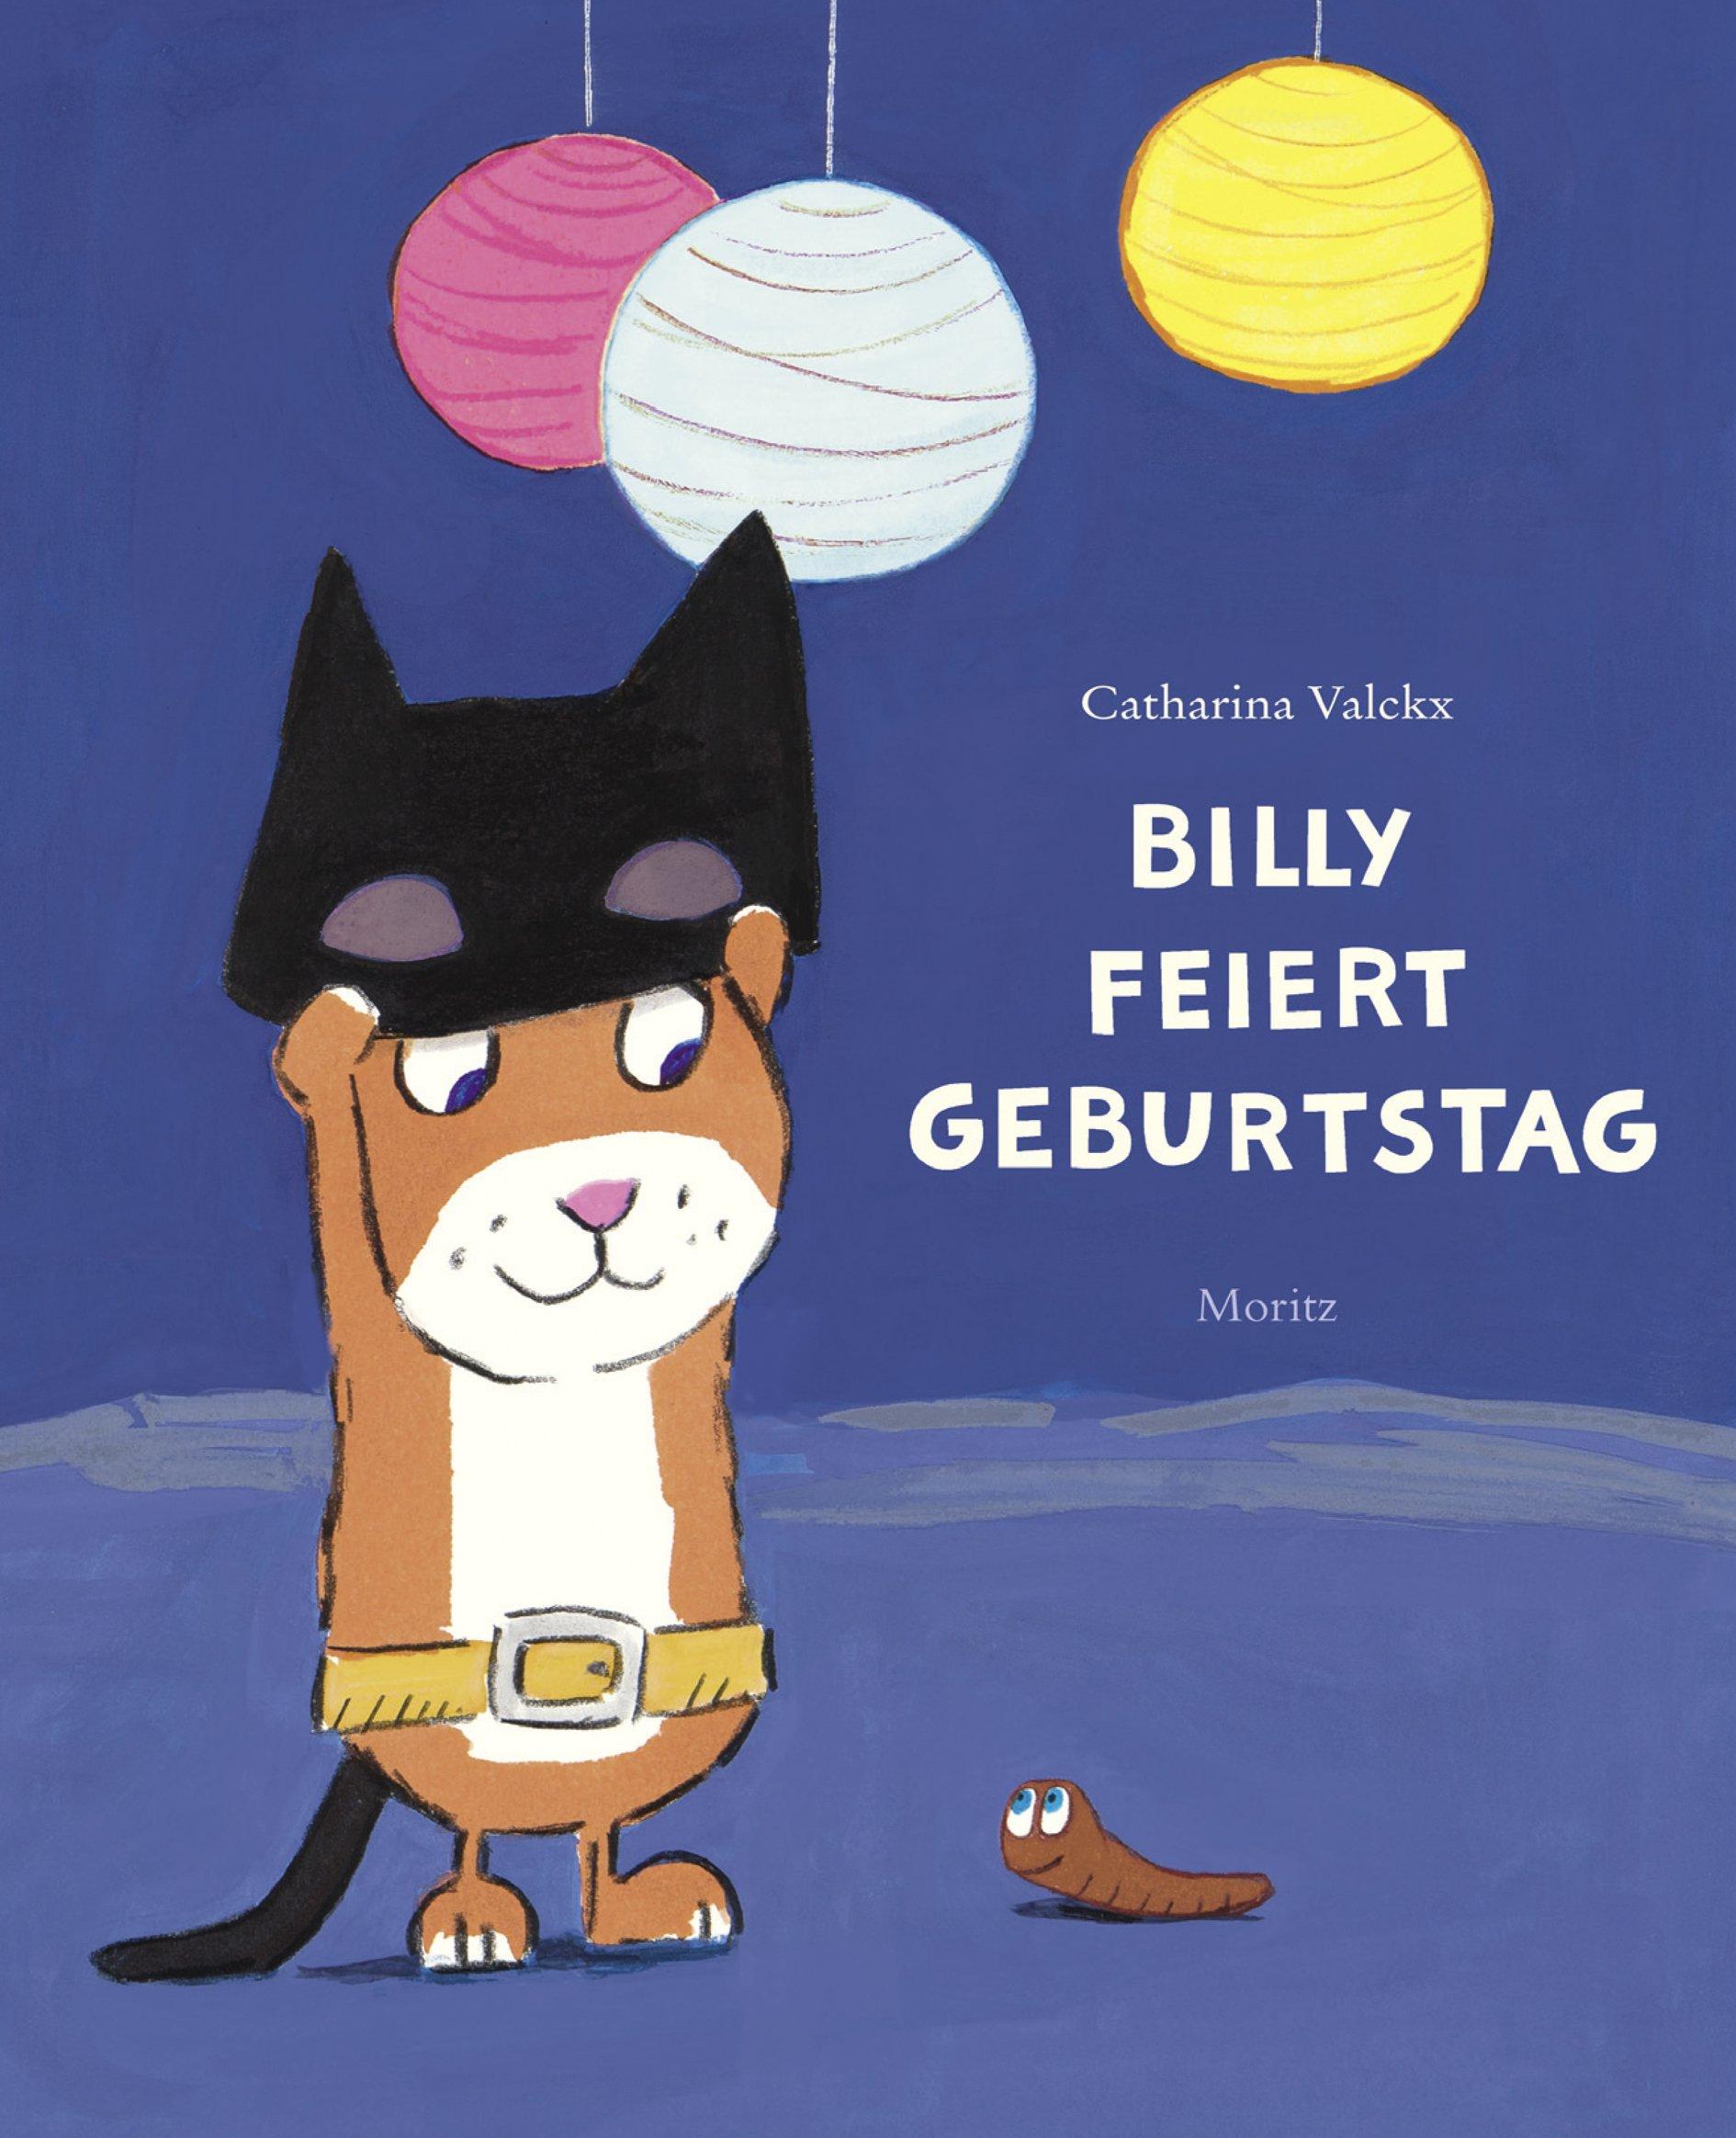 »BILLY FEIERT GEBURTSTAG«  — MORITZ